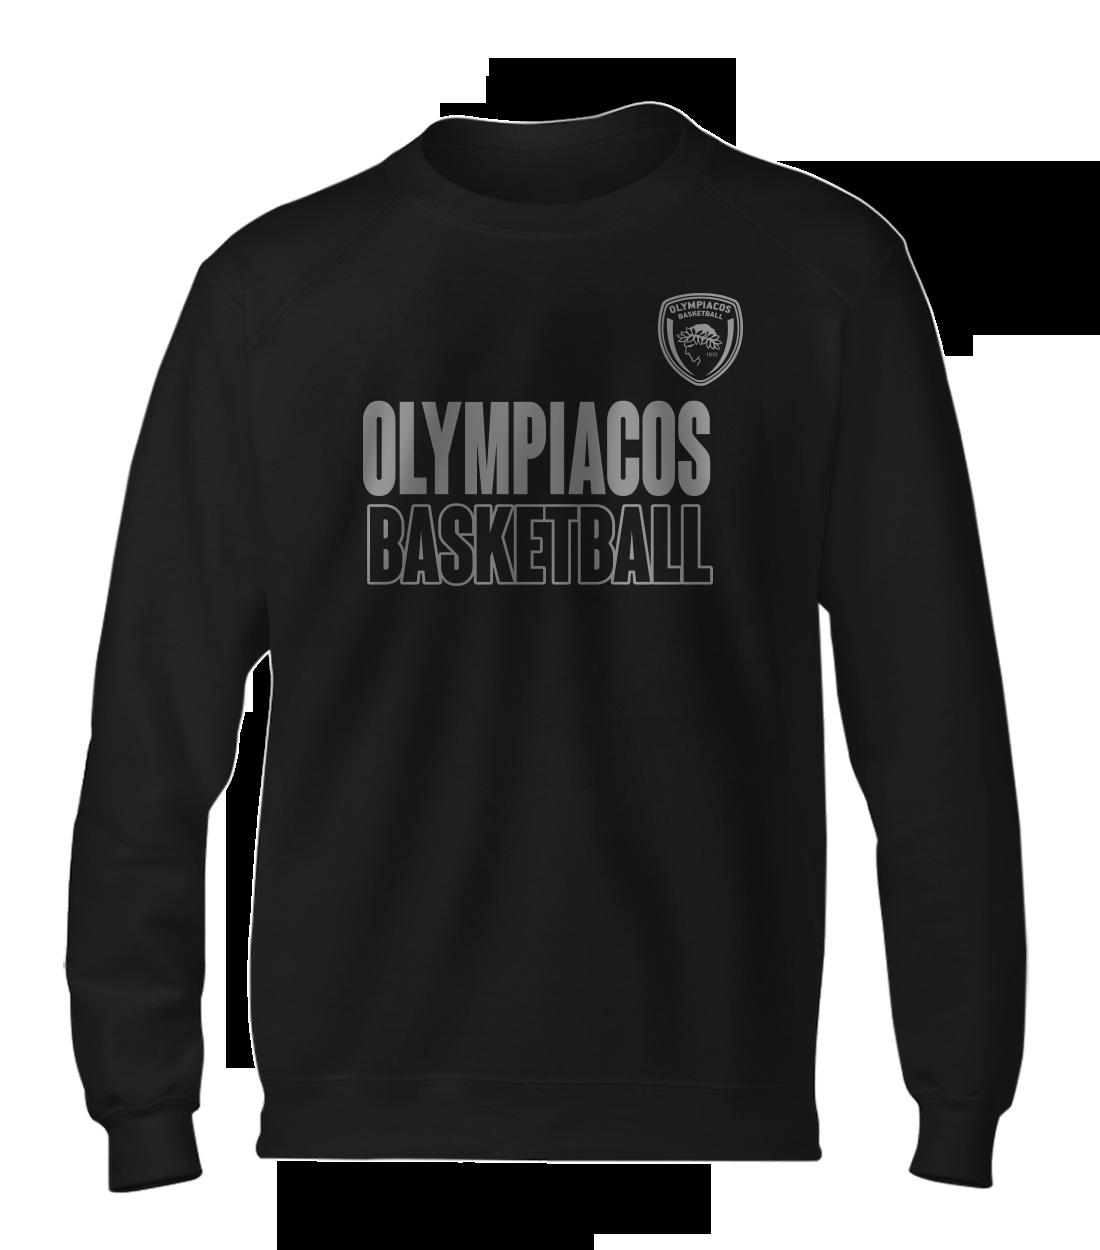 Olympiakos Basic (BSC-BLC-NP-229-EURO-OLYM-BASKETBALL)